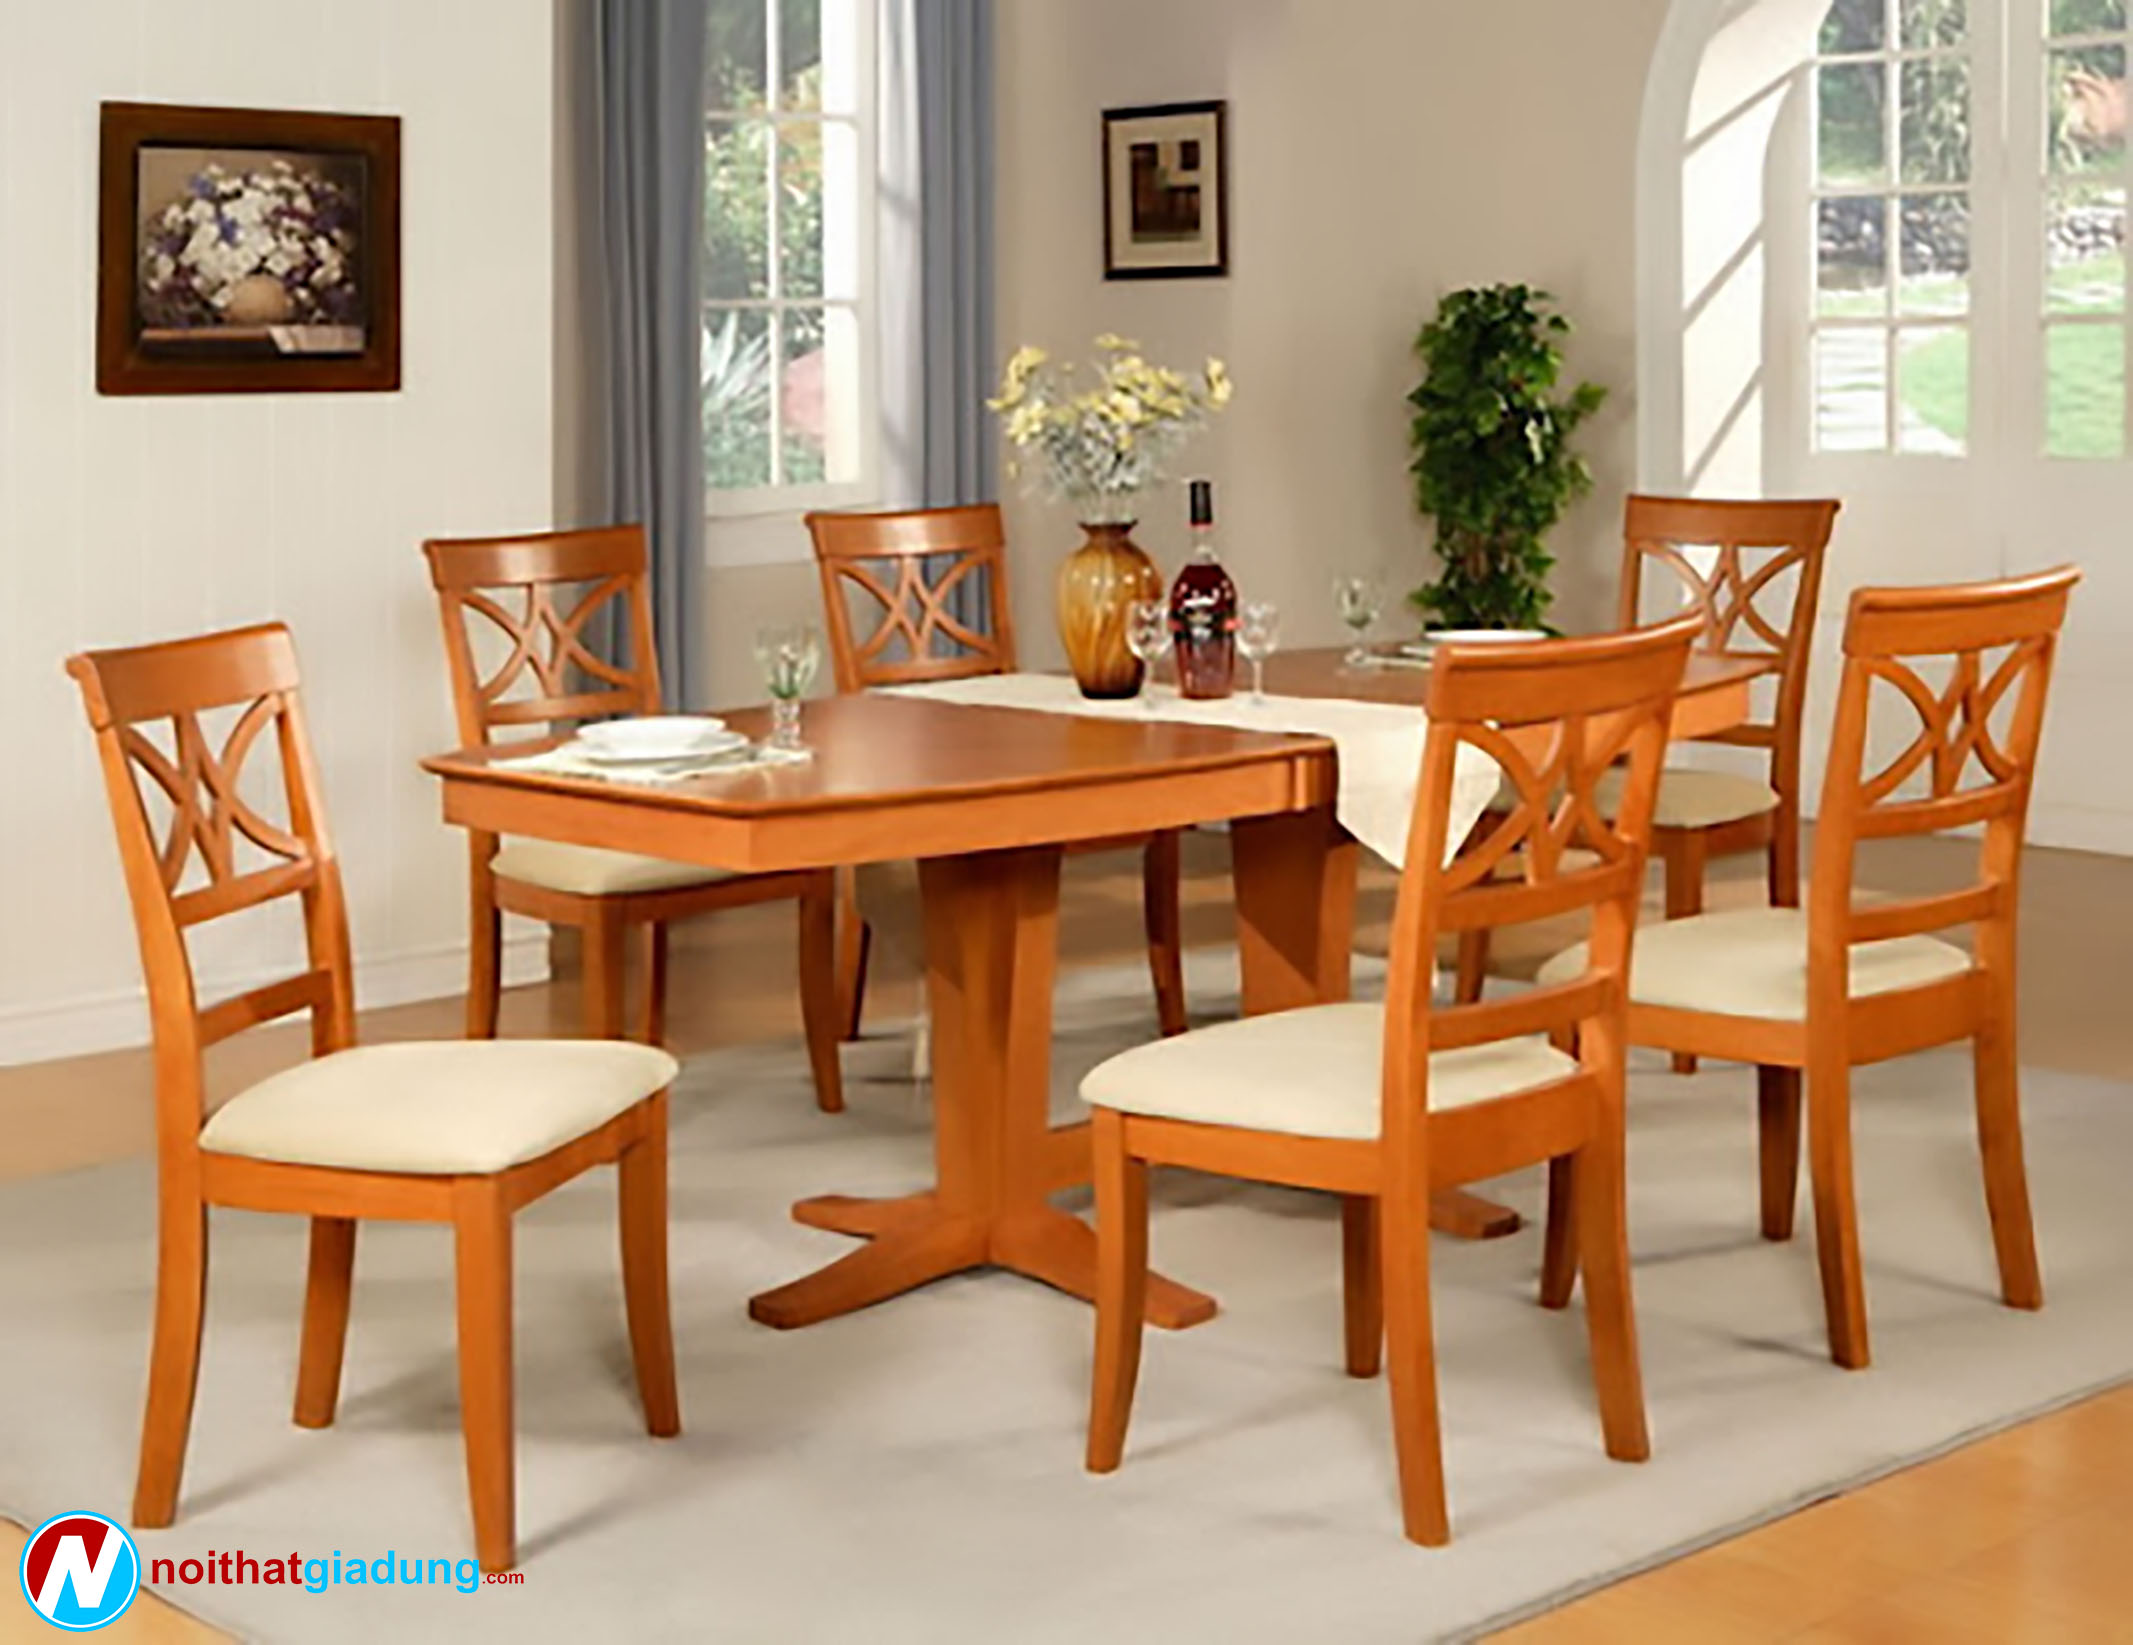 bộ bàn ăn gỗ truyền thống